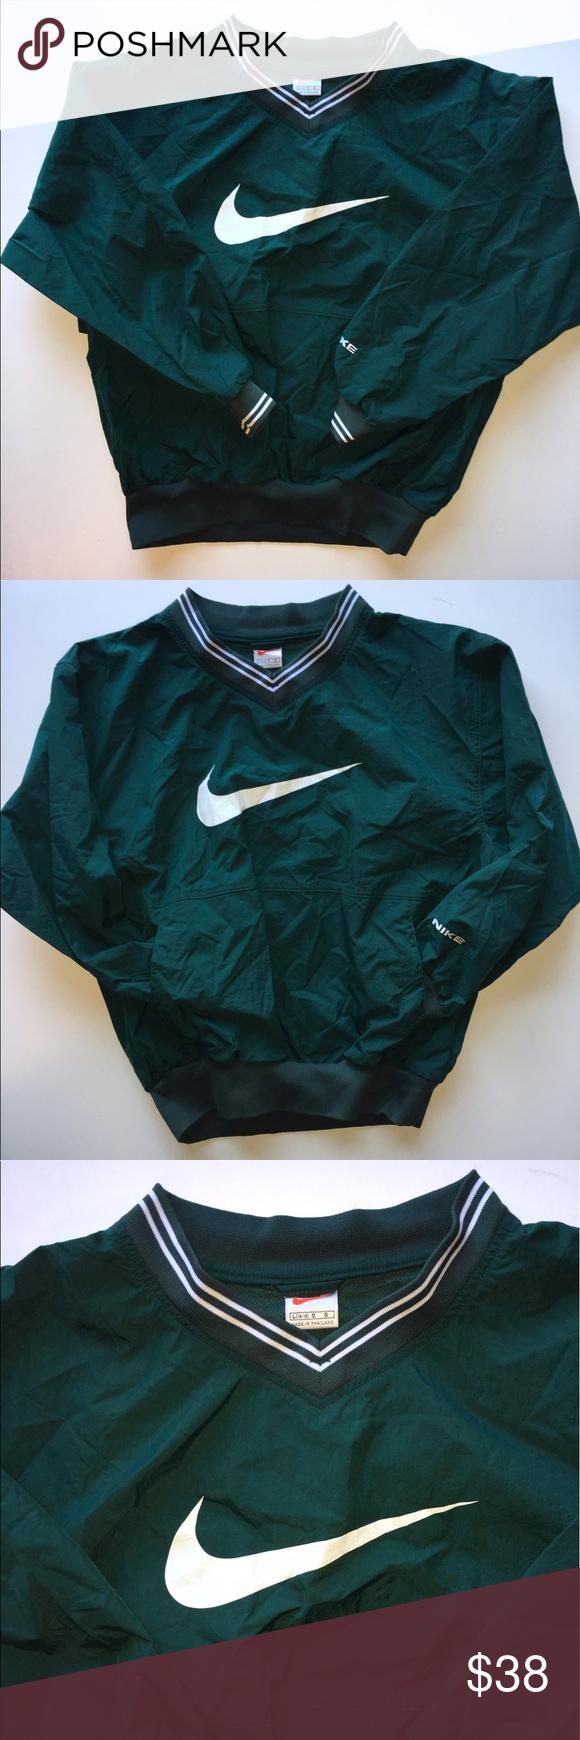 Vintage Nike Forest Green Pullover Nike Windbreaker Jacket Clothes Vintage Nike [ 1740 x 580 Pixel ]